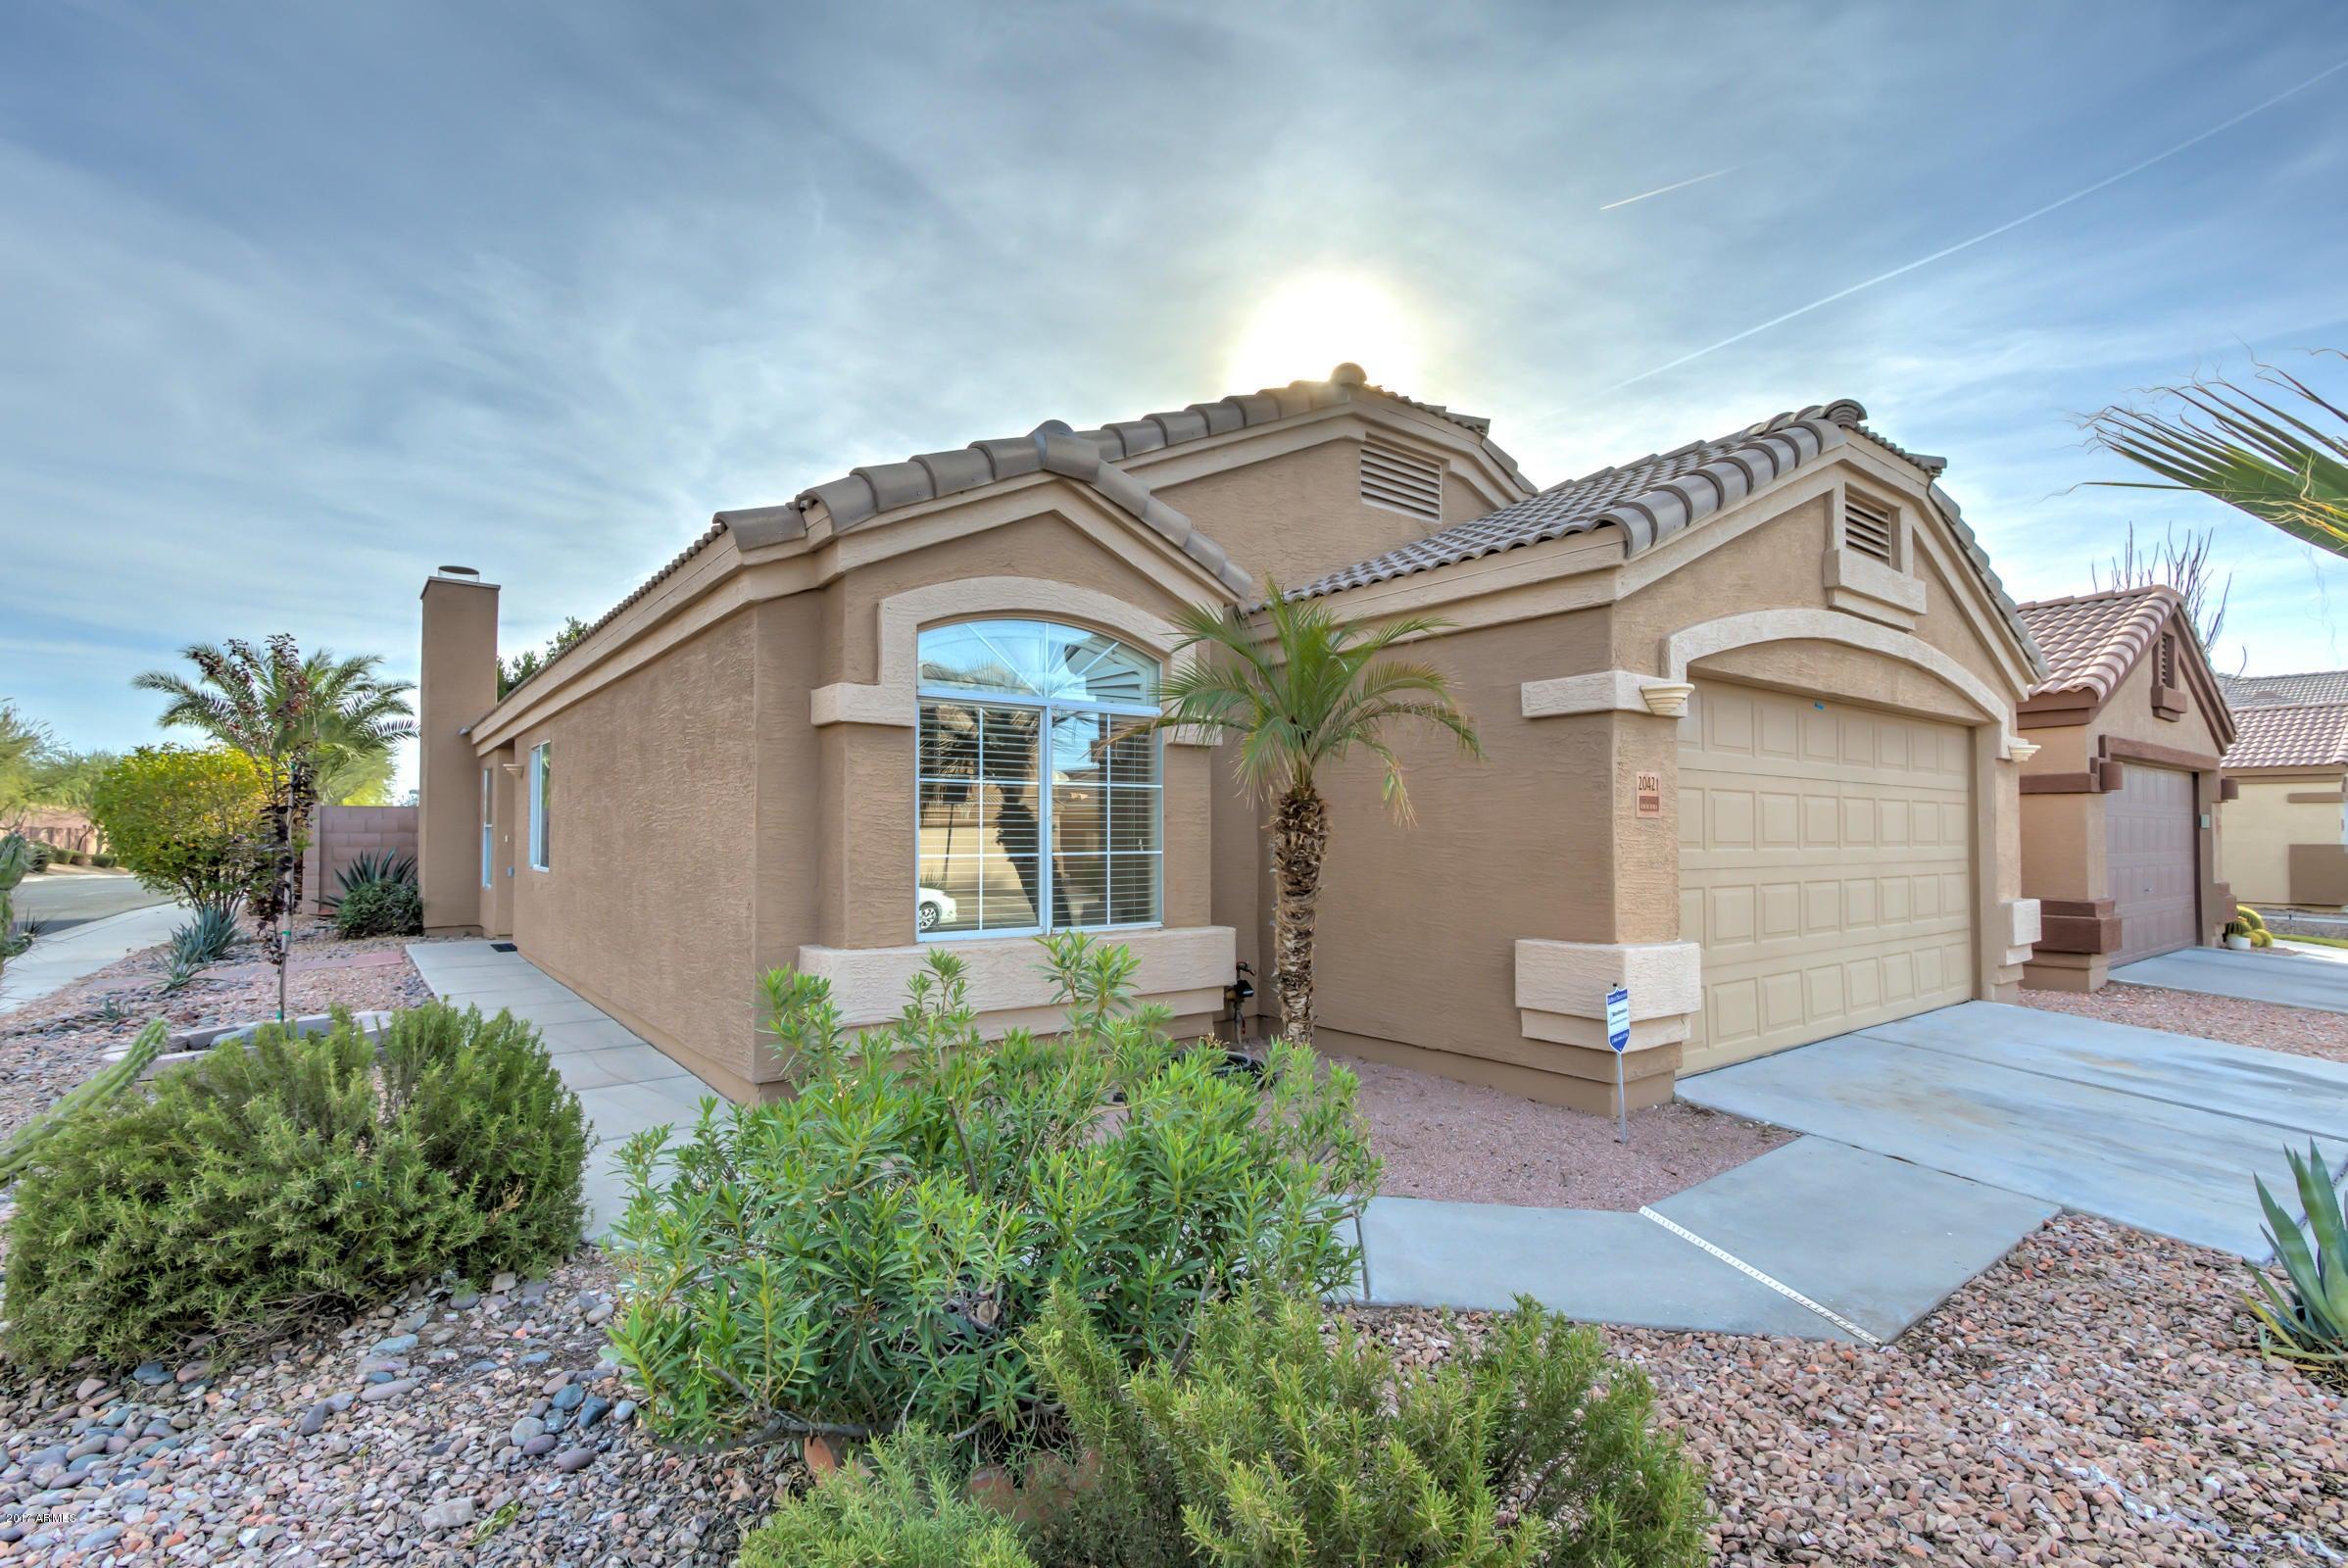 20421 N 30TH Place, Phoenix, AZ 85050